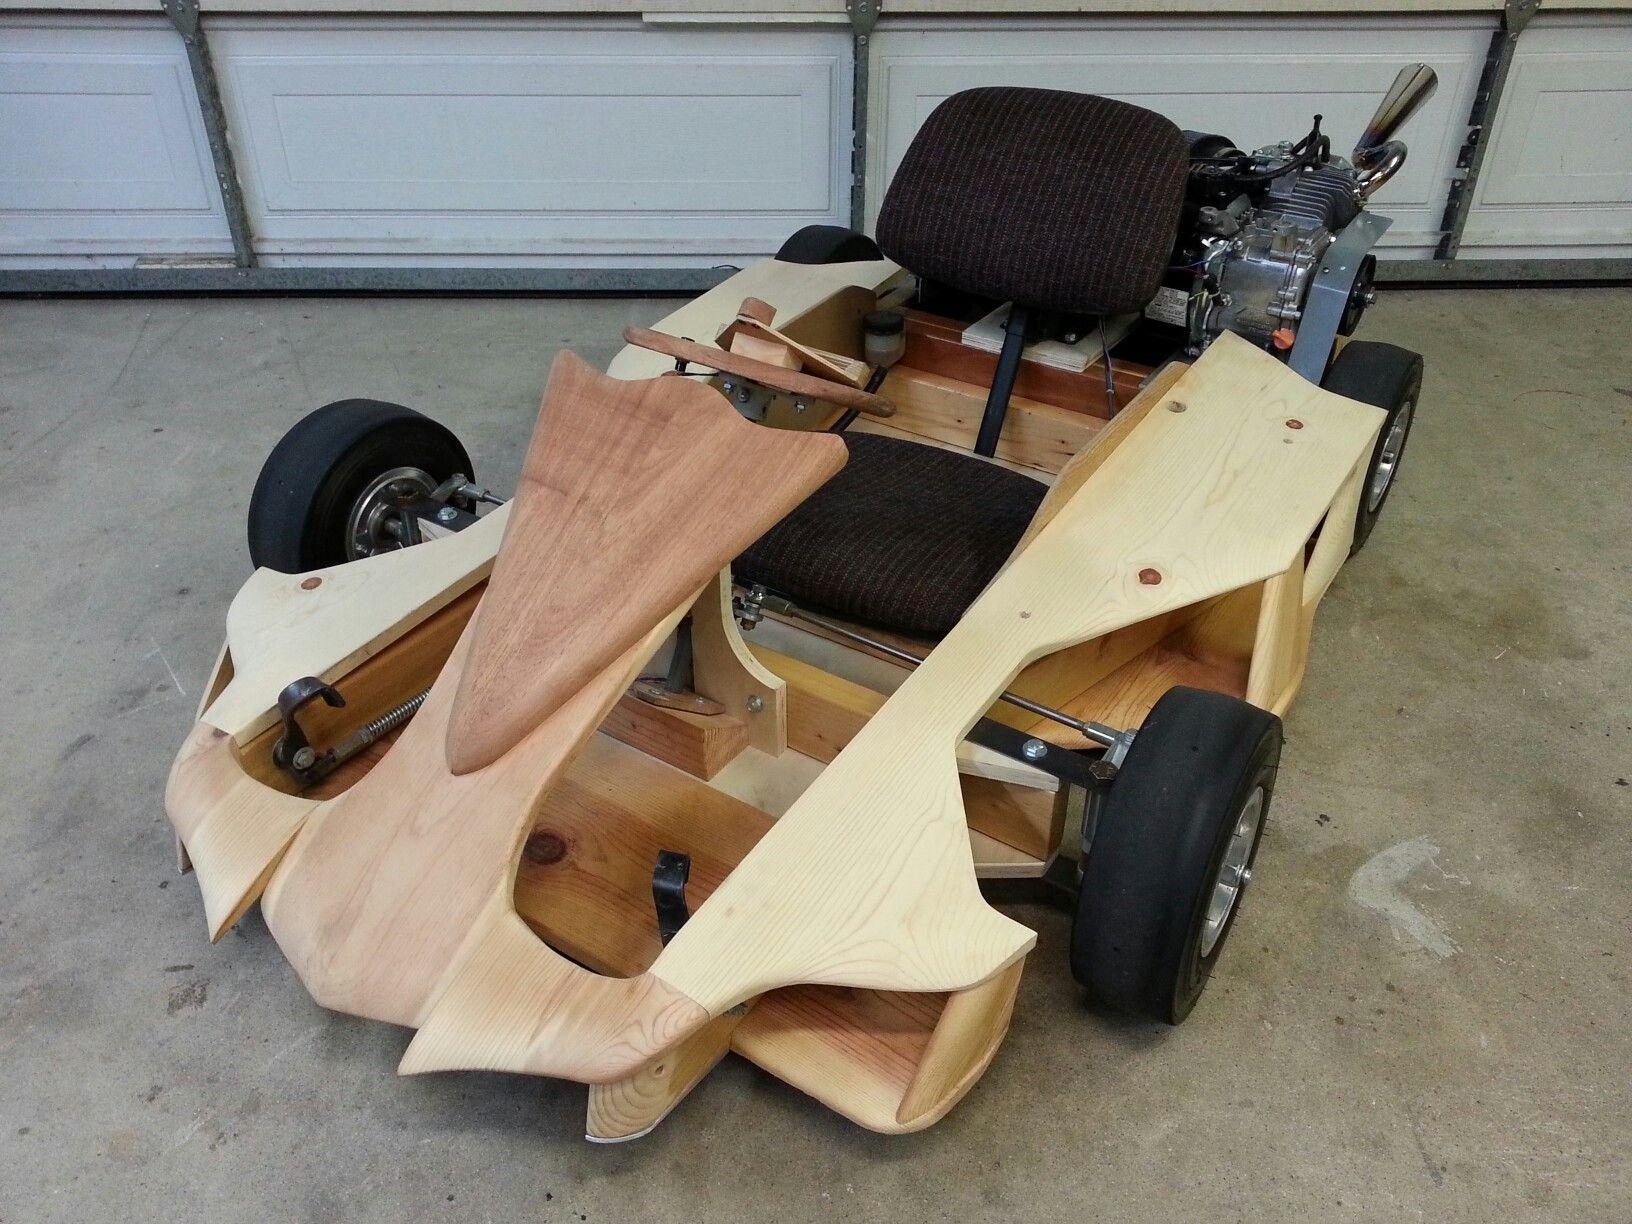 Pin By Pierre Demers On Wooden Go Kart Wooden Go Kart Go Kart